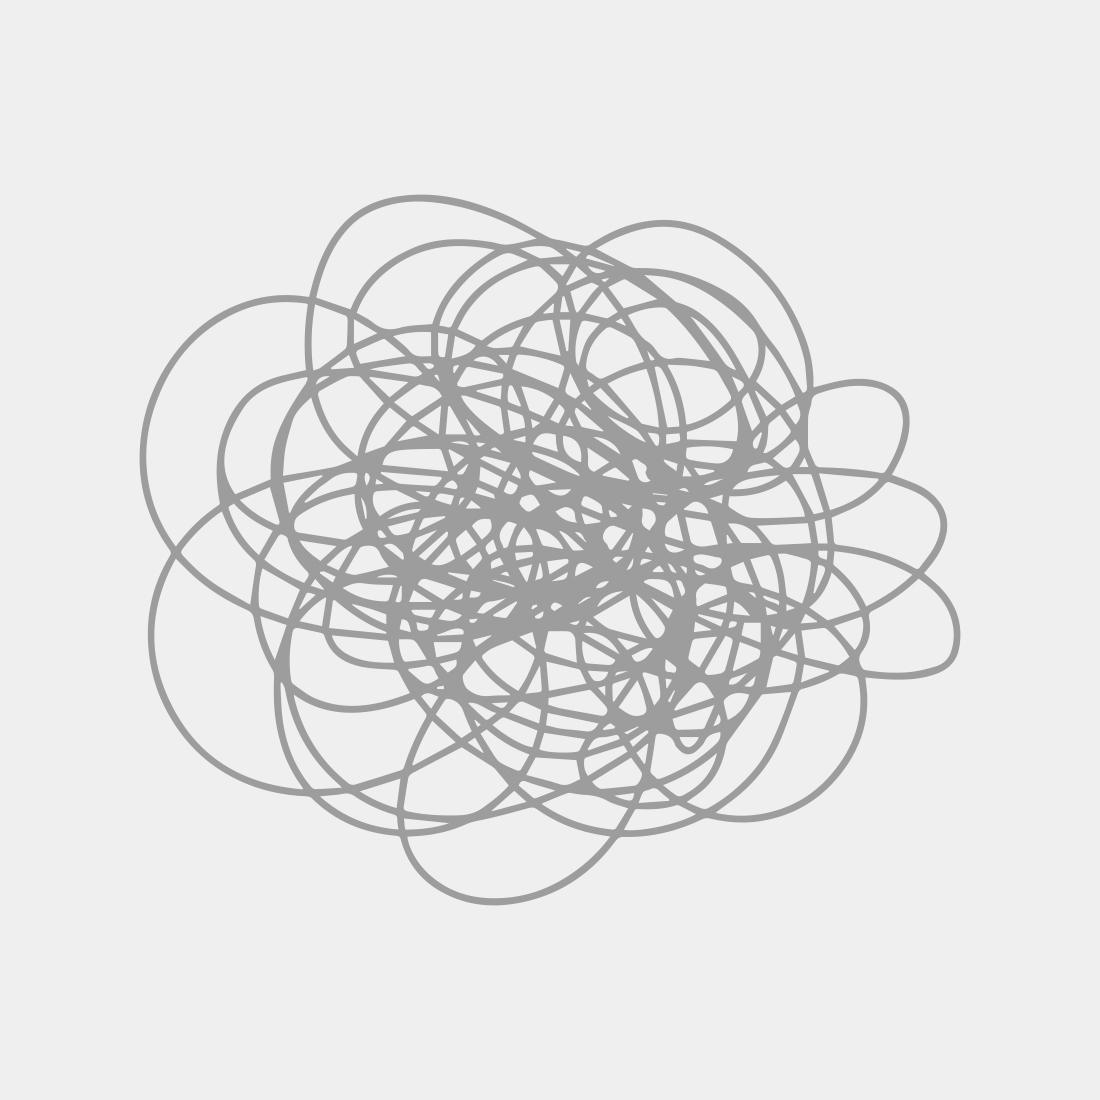 Albert Irvin OBE RA Untitled opus w.33